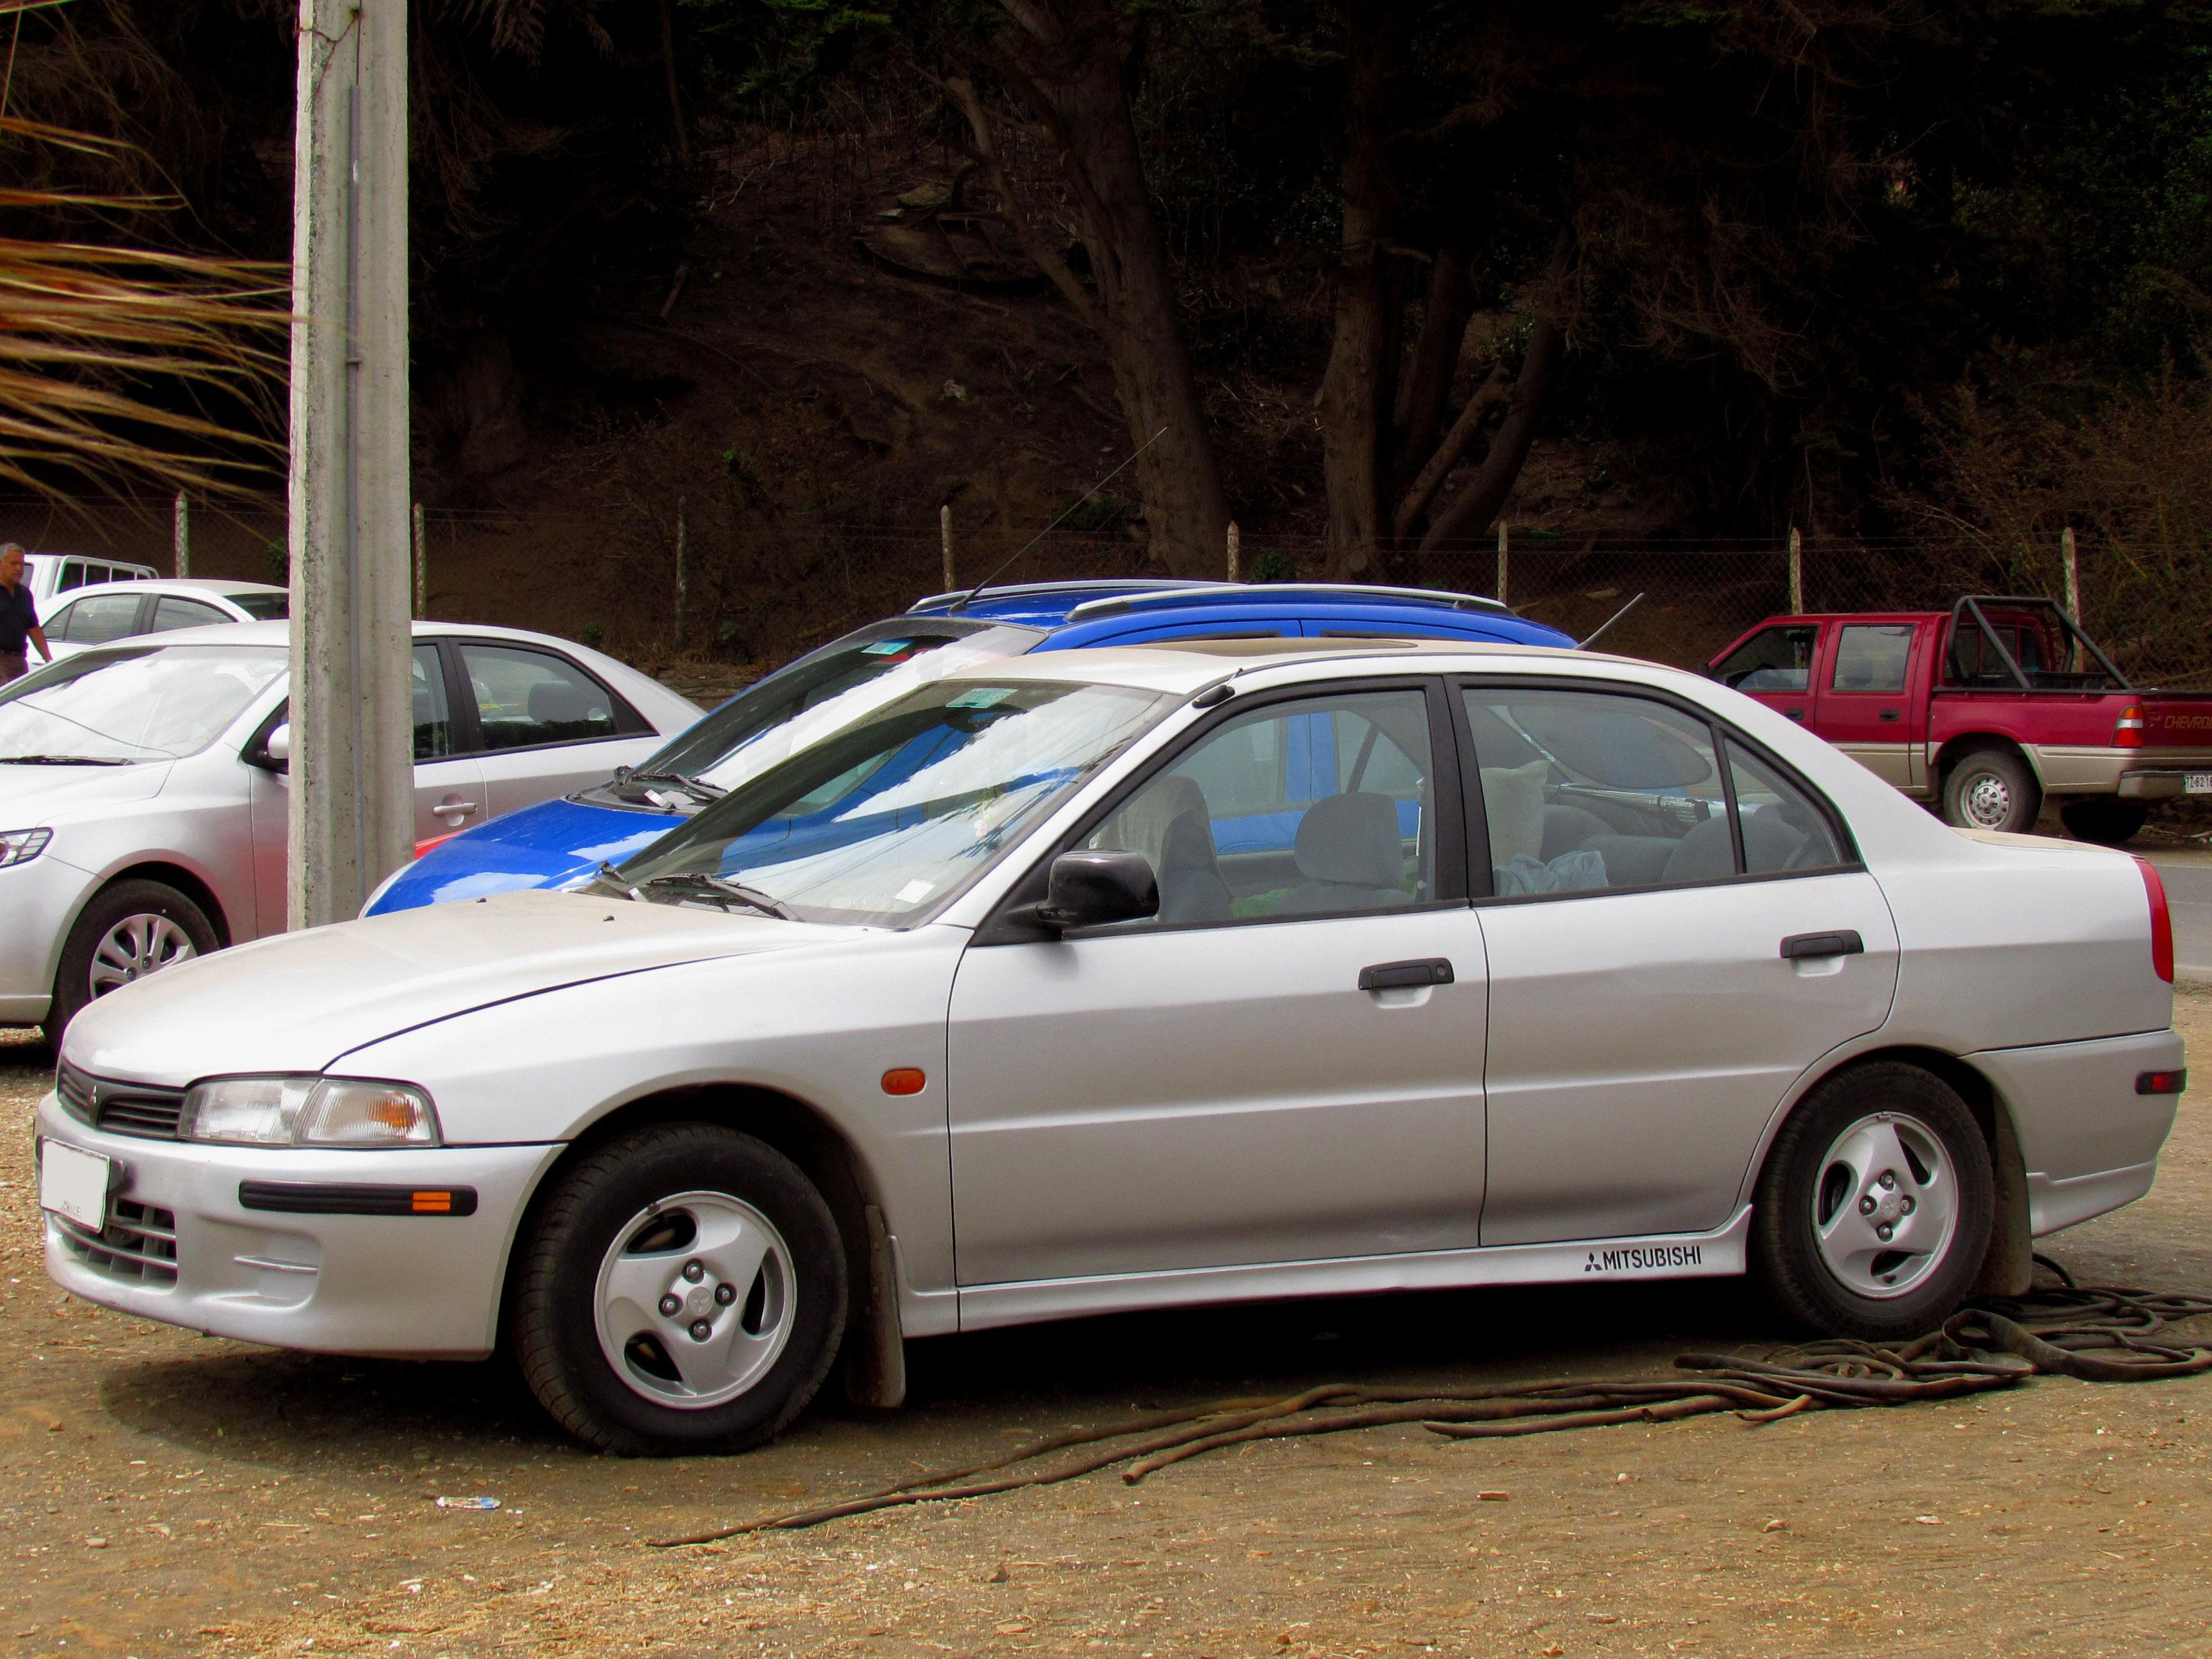 File:Mitsubishi Lancer 1.6 GLXi 1997 (14189885608).jpg